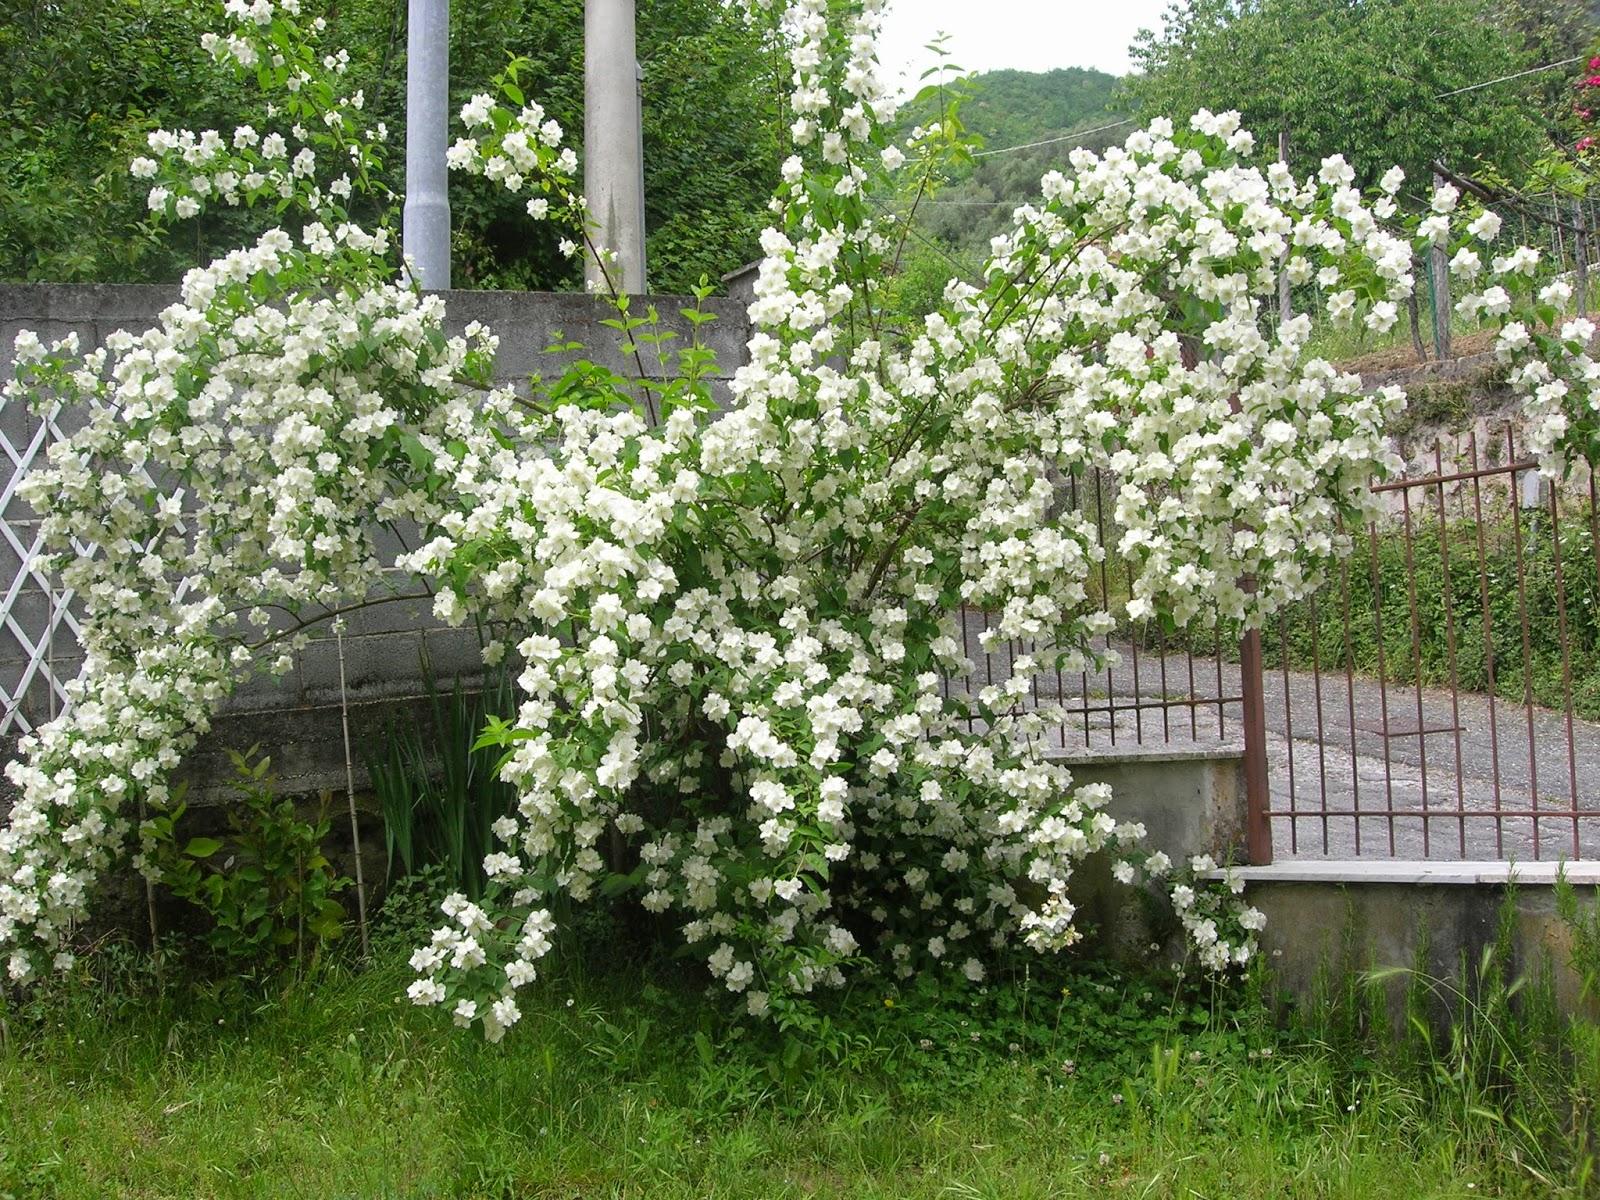 Semola angoli di giardino for Foto angoli giardino